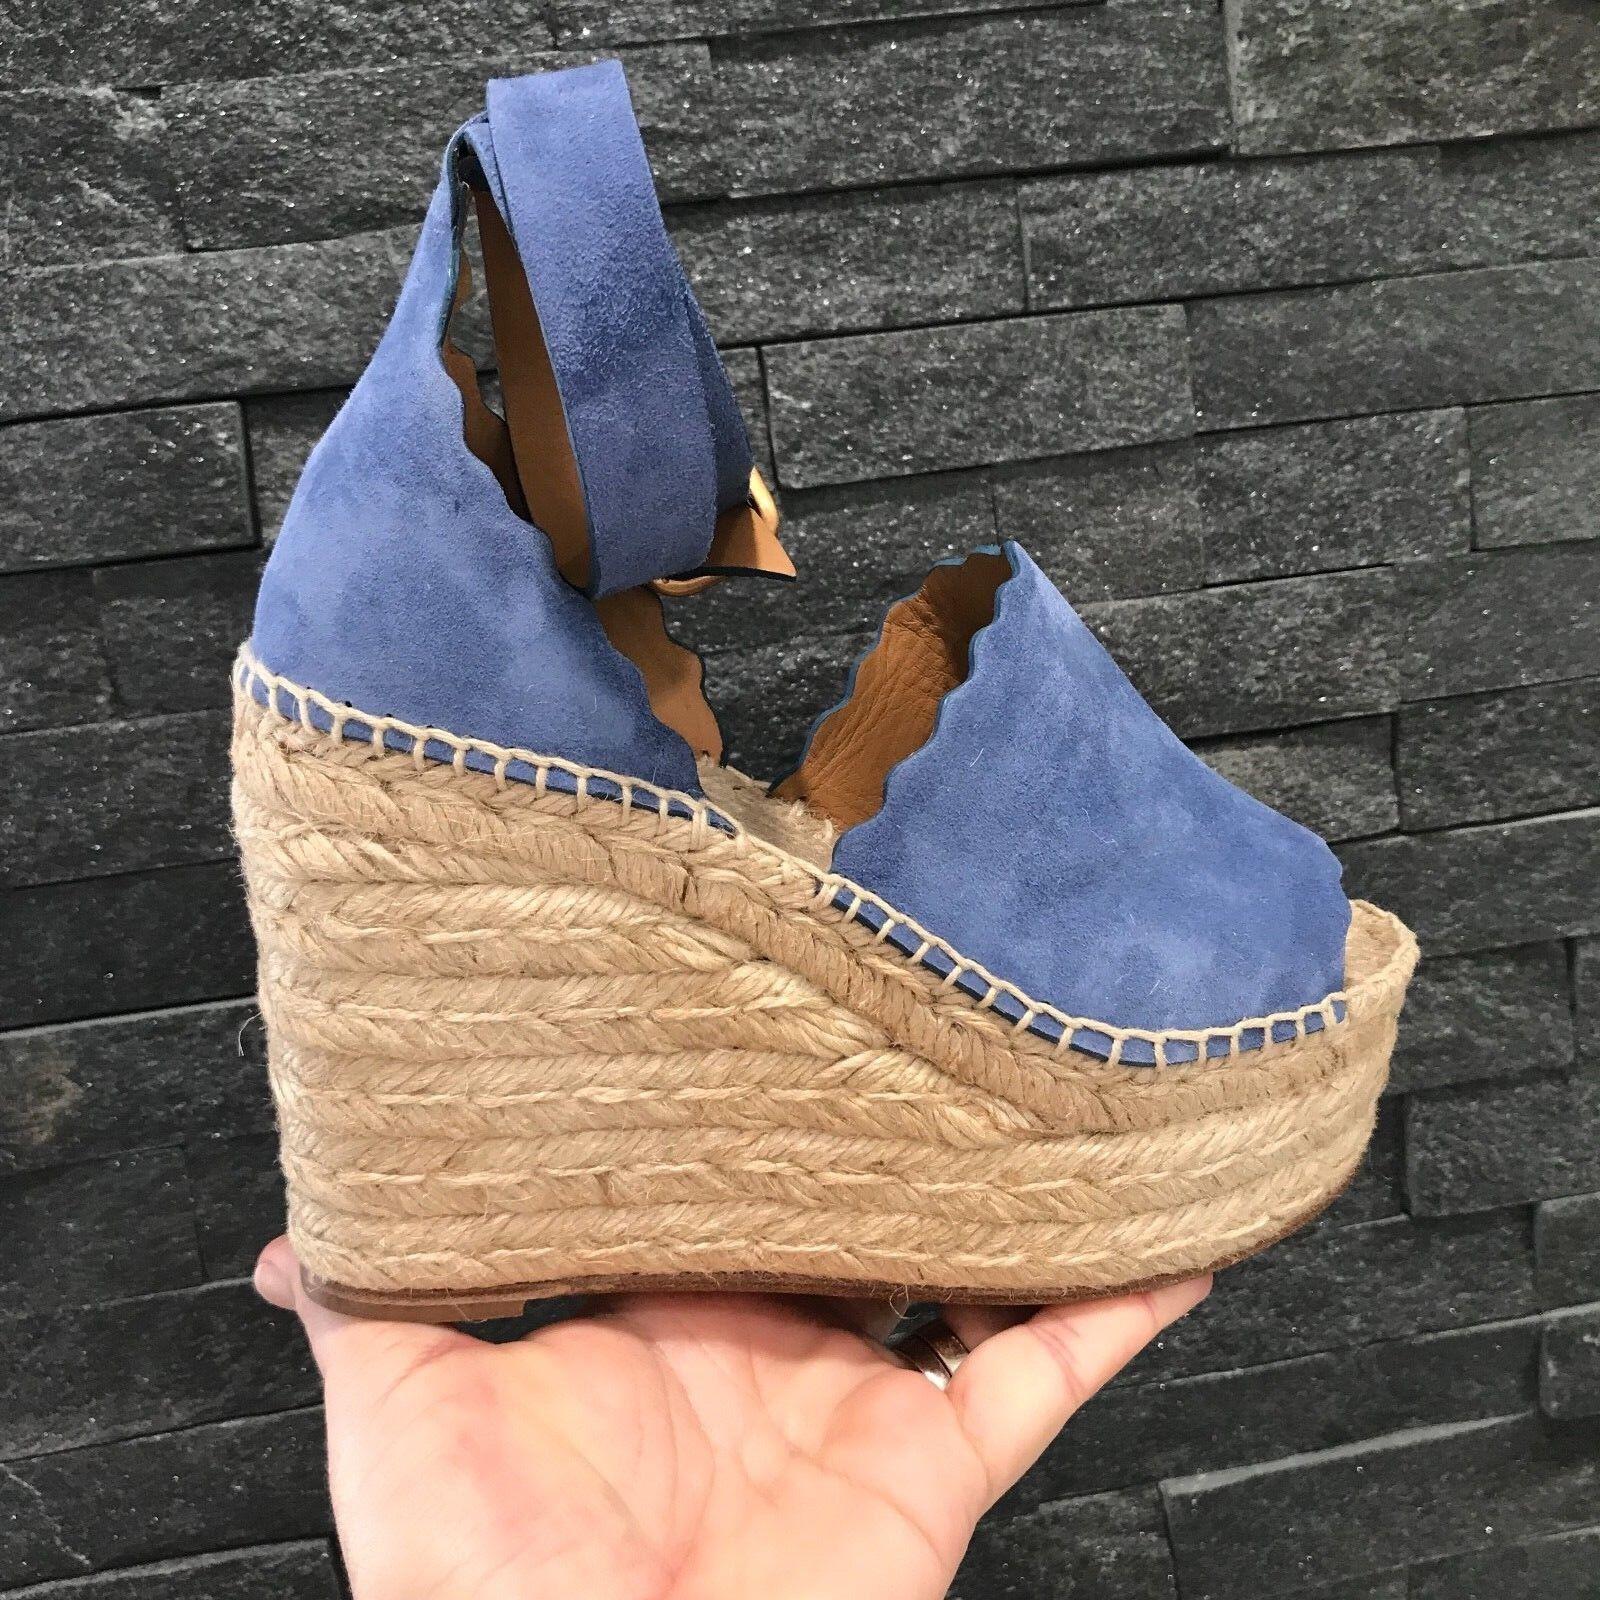 NIB Chloe Cobalt Suede Lauren Espadrille Platform Wedge Sandals Sz 42  660